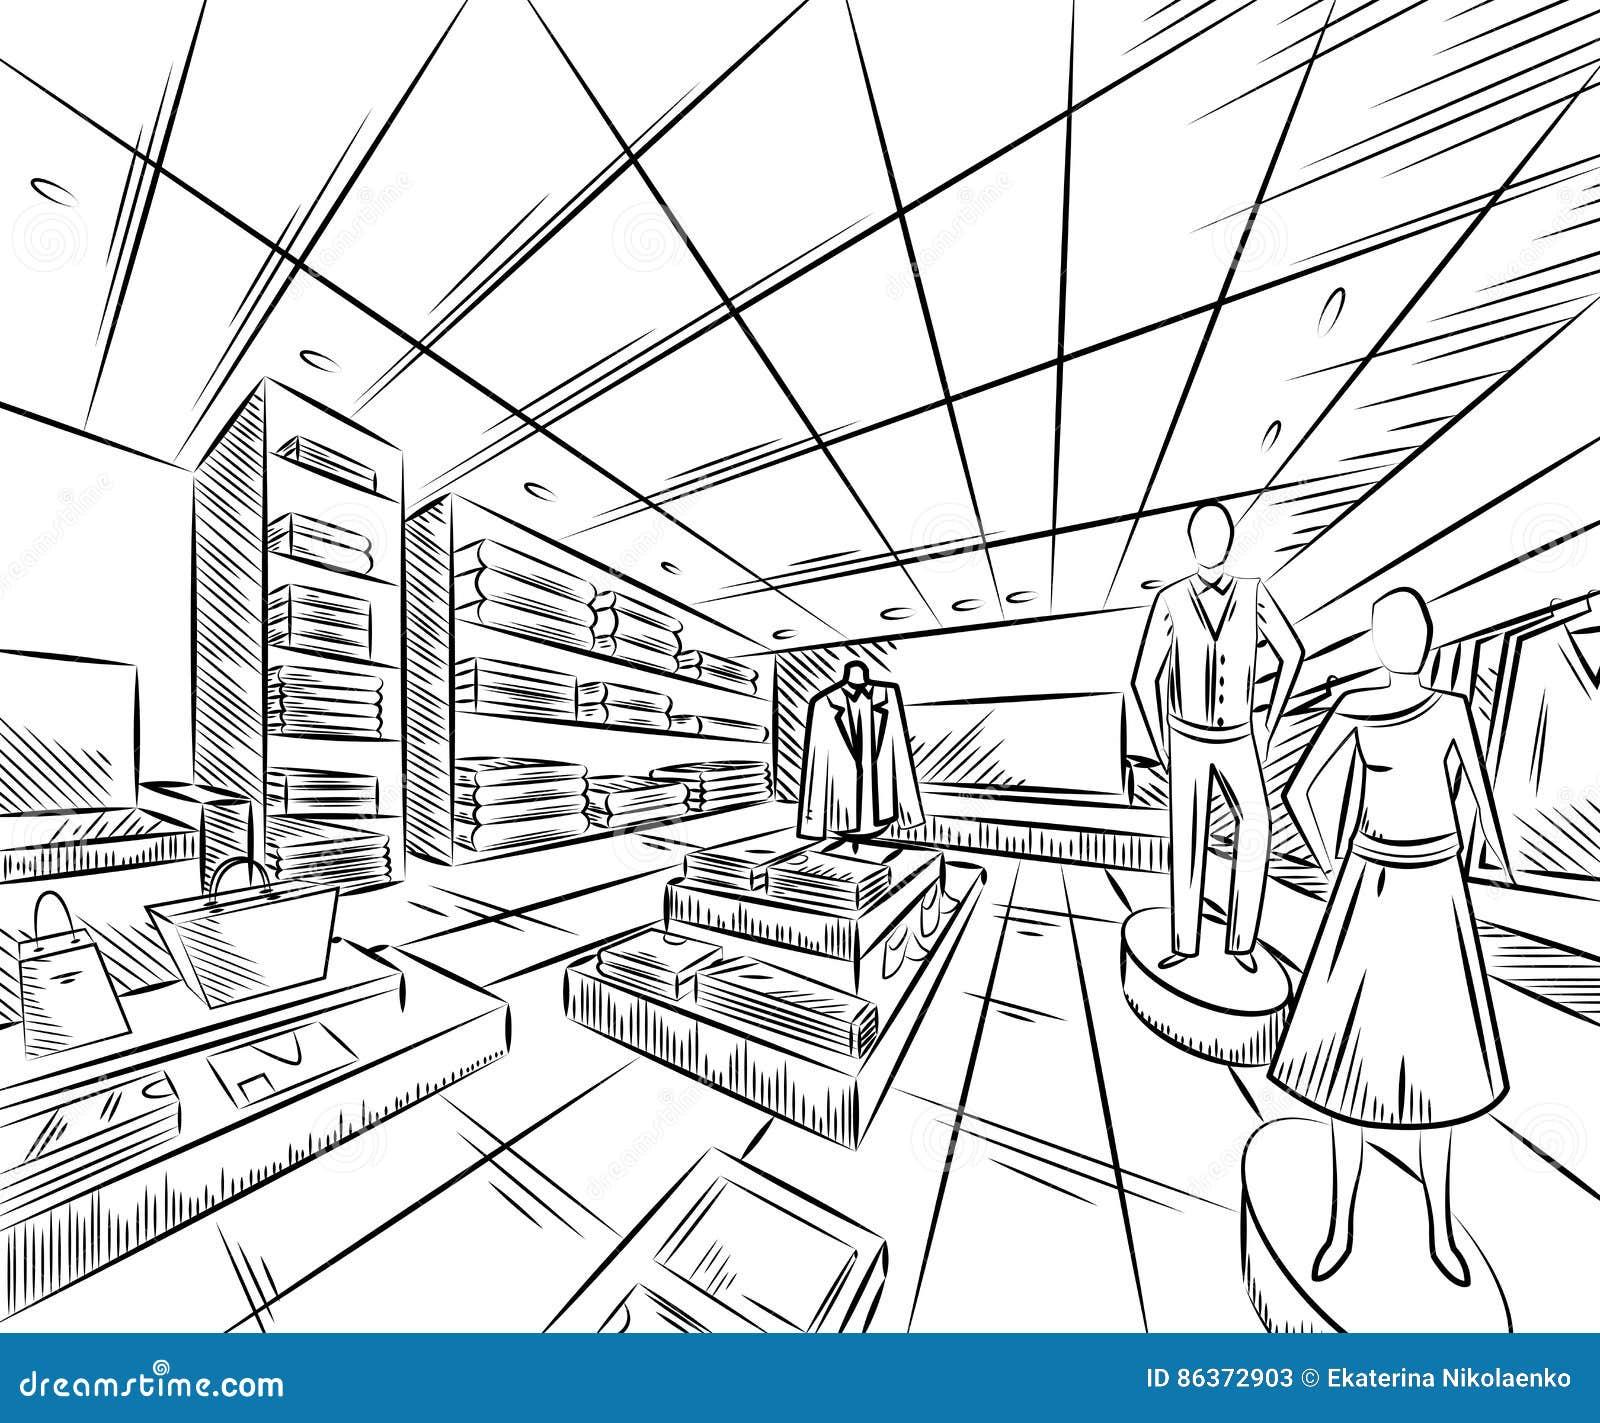 Fashion Store Interior Design In Sketch Style Stock Vector Image 86372903